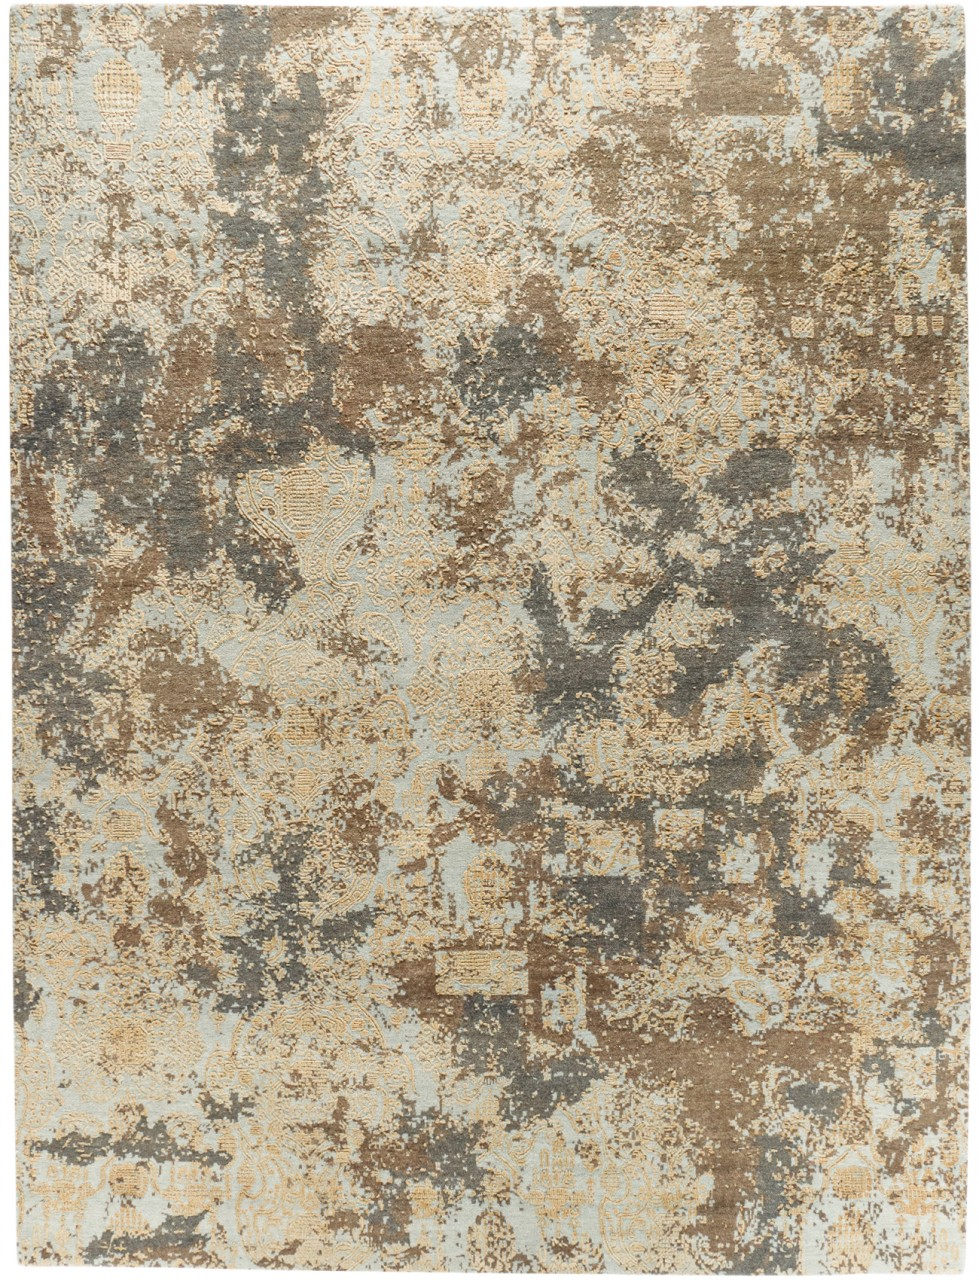 Design-Teppich Fresko